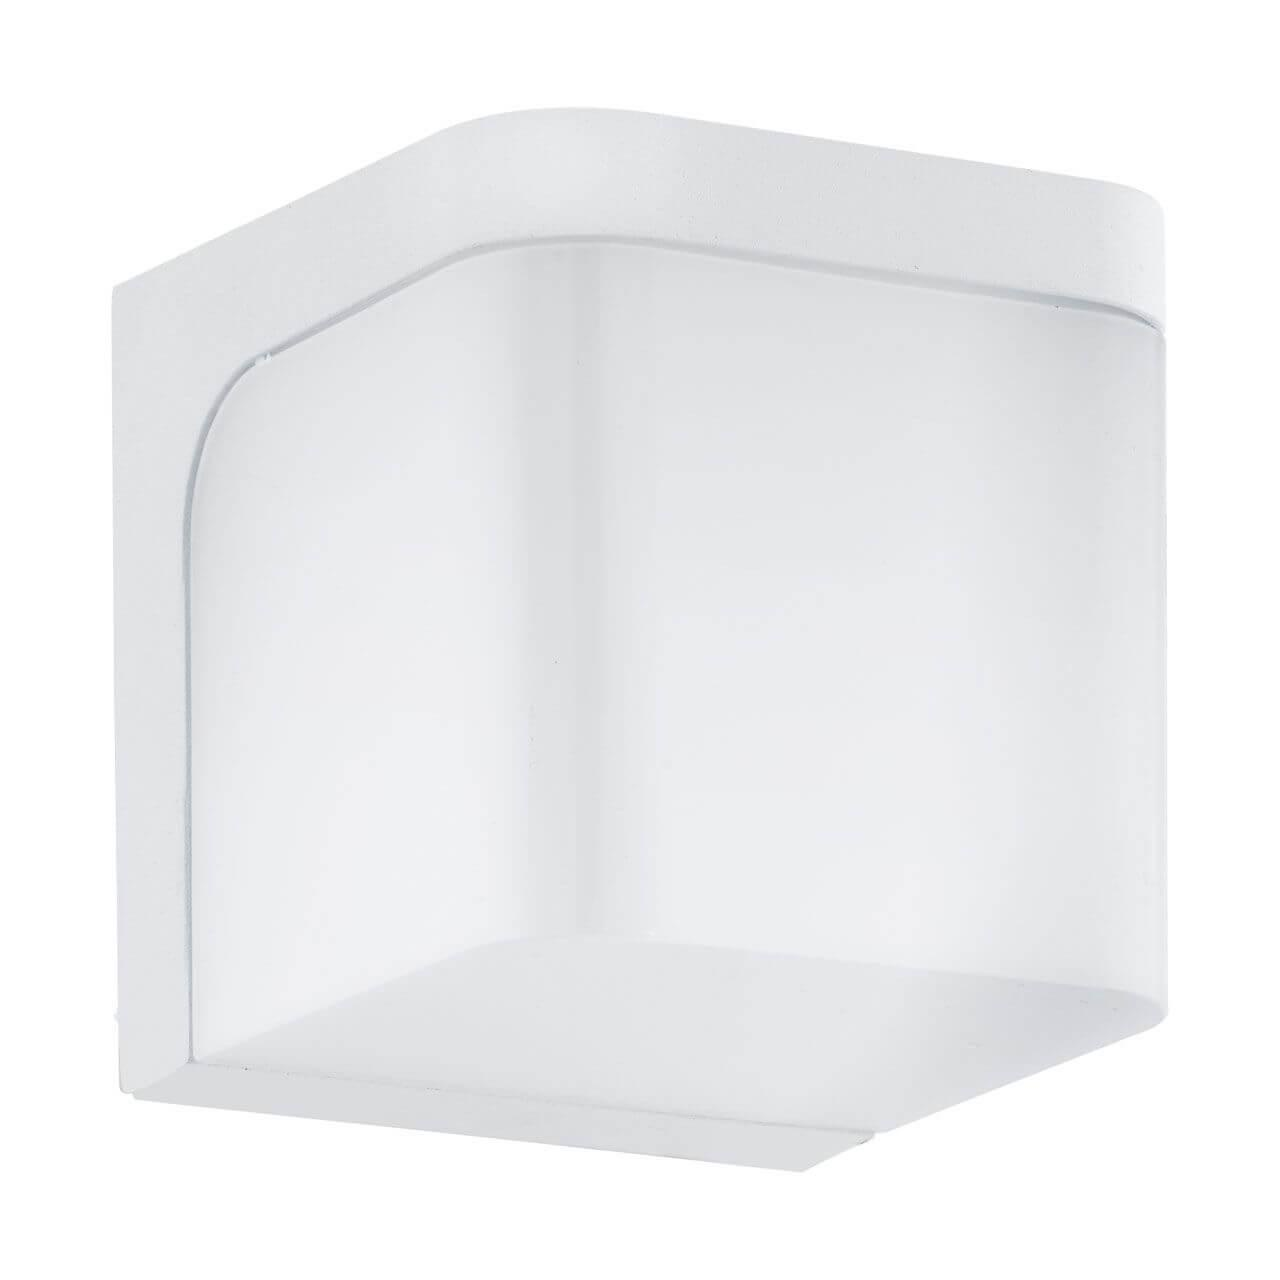 Уличный светильник Eglo 96255, белый eglo tinnari 91635